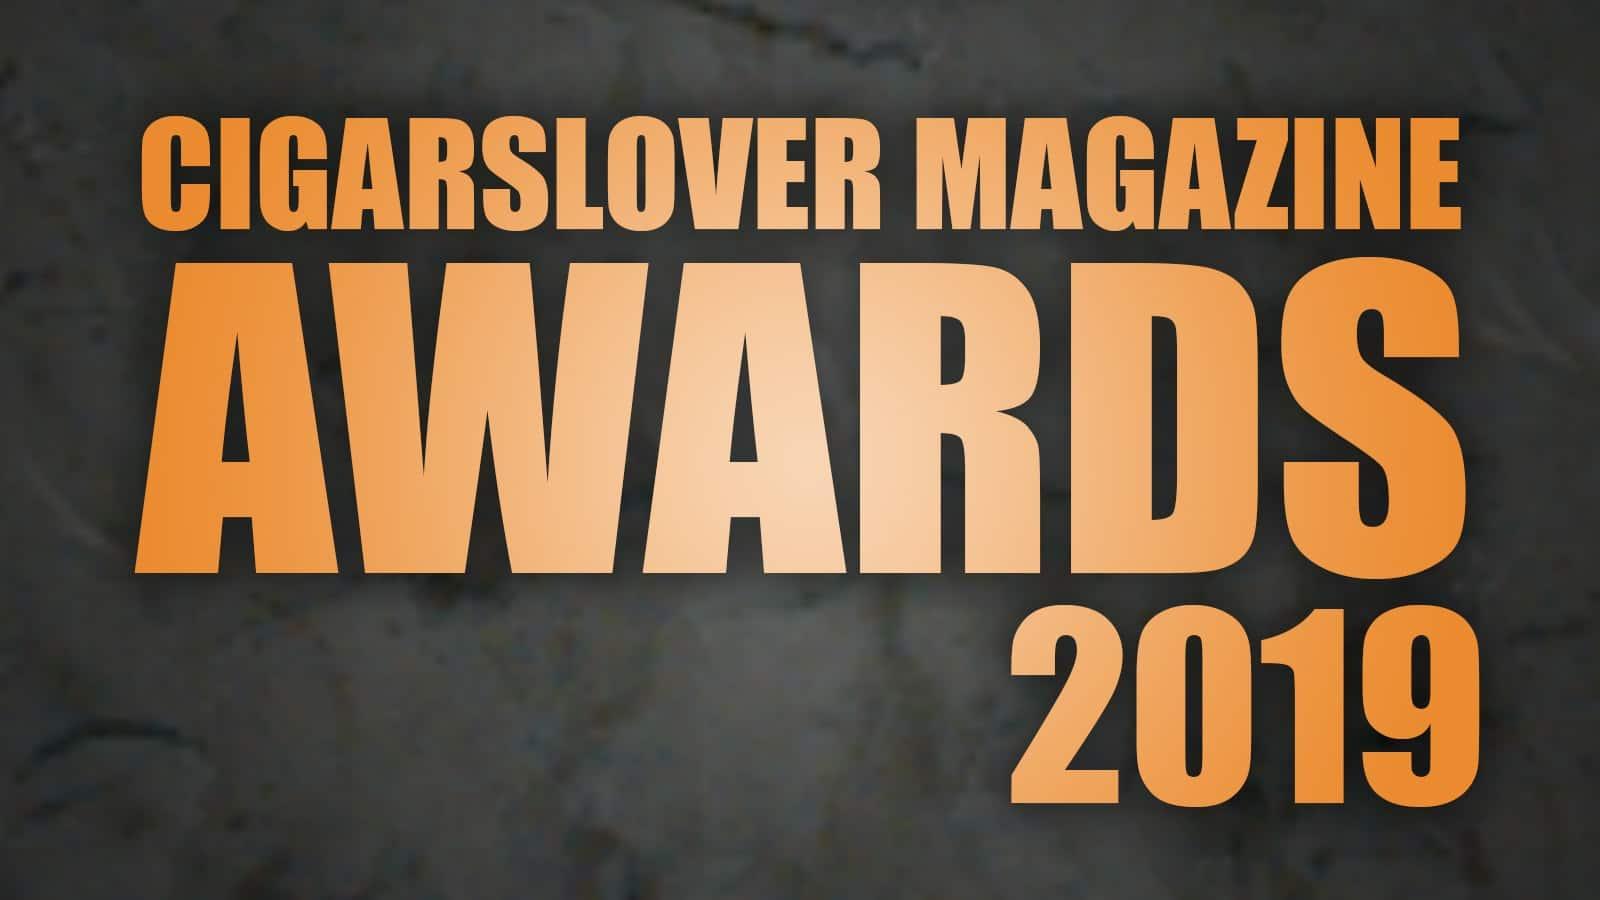 CigarsLover Magazine Awards 2019 Best whisky